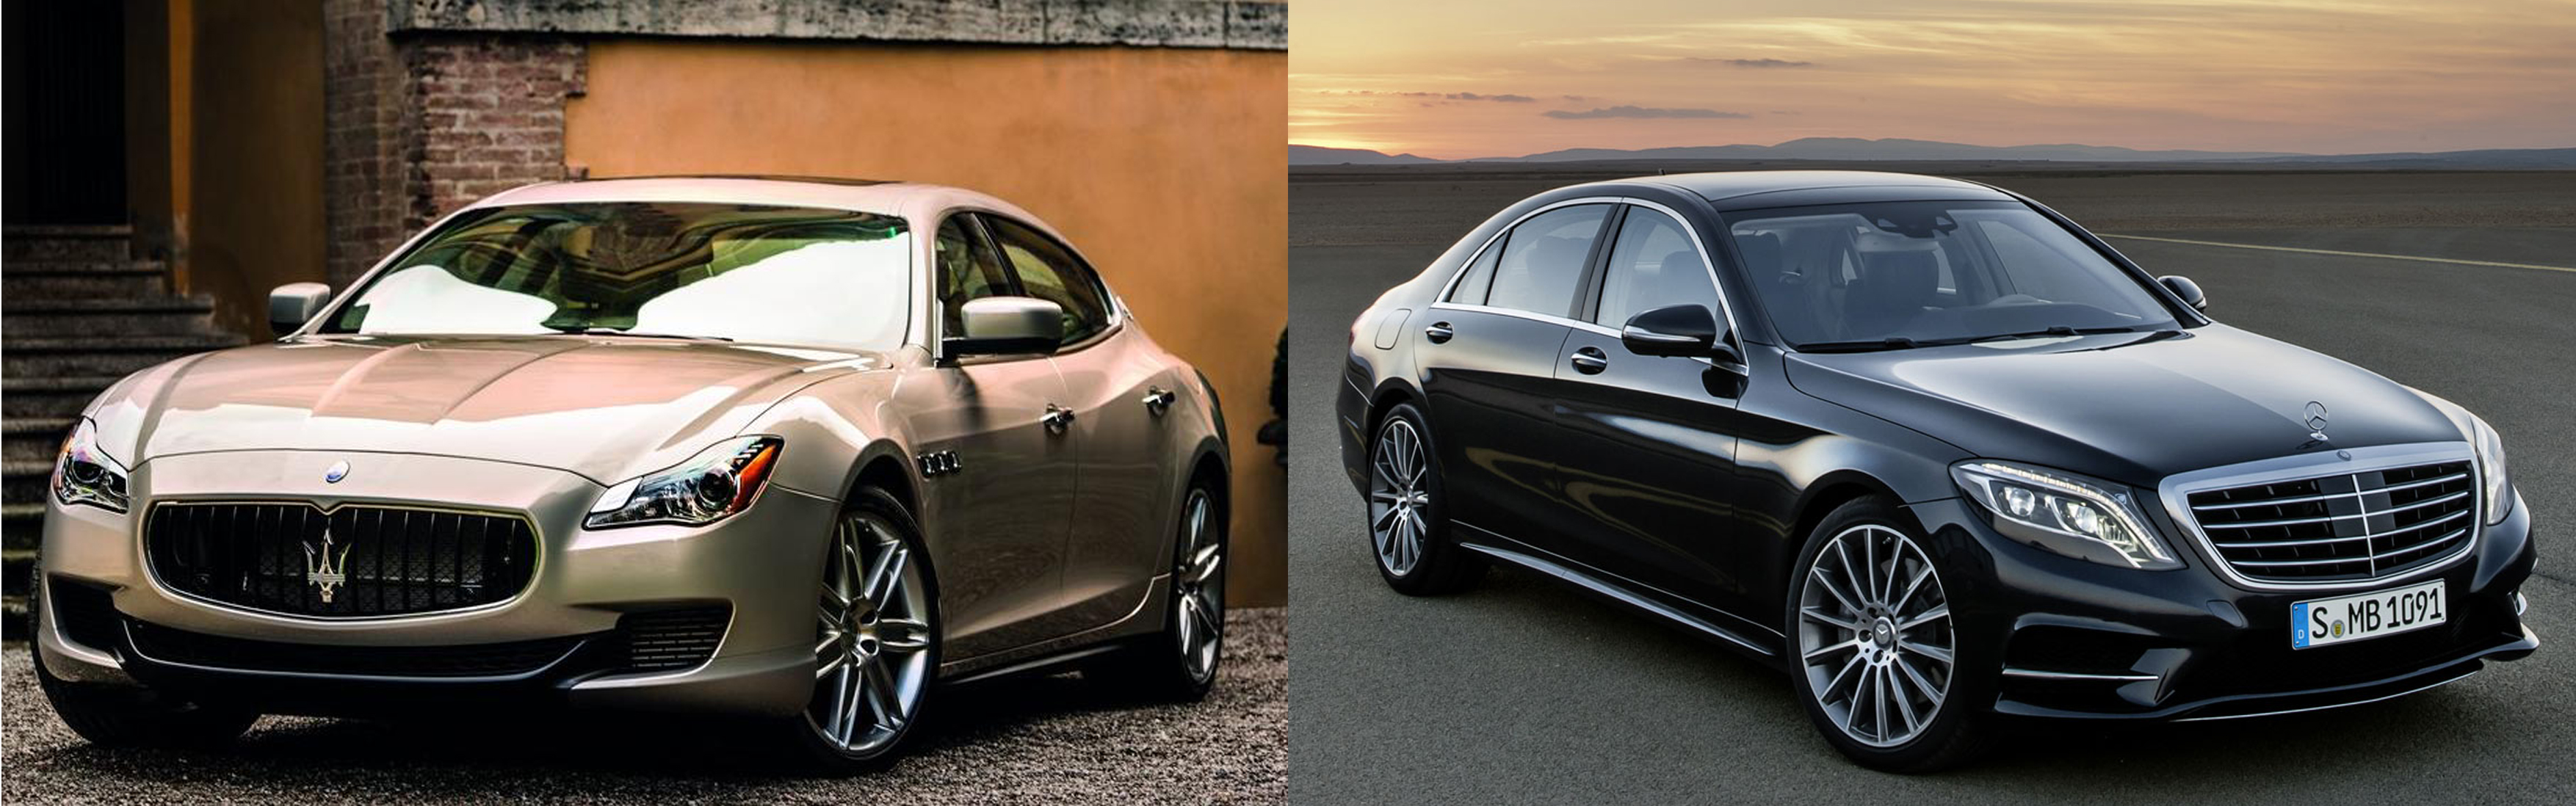 Maserati quattroporte or mercedes benz s class fiat for Mercedes benz v